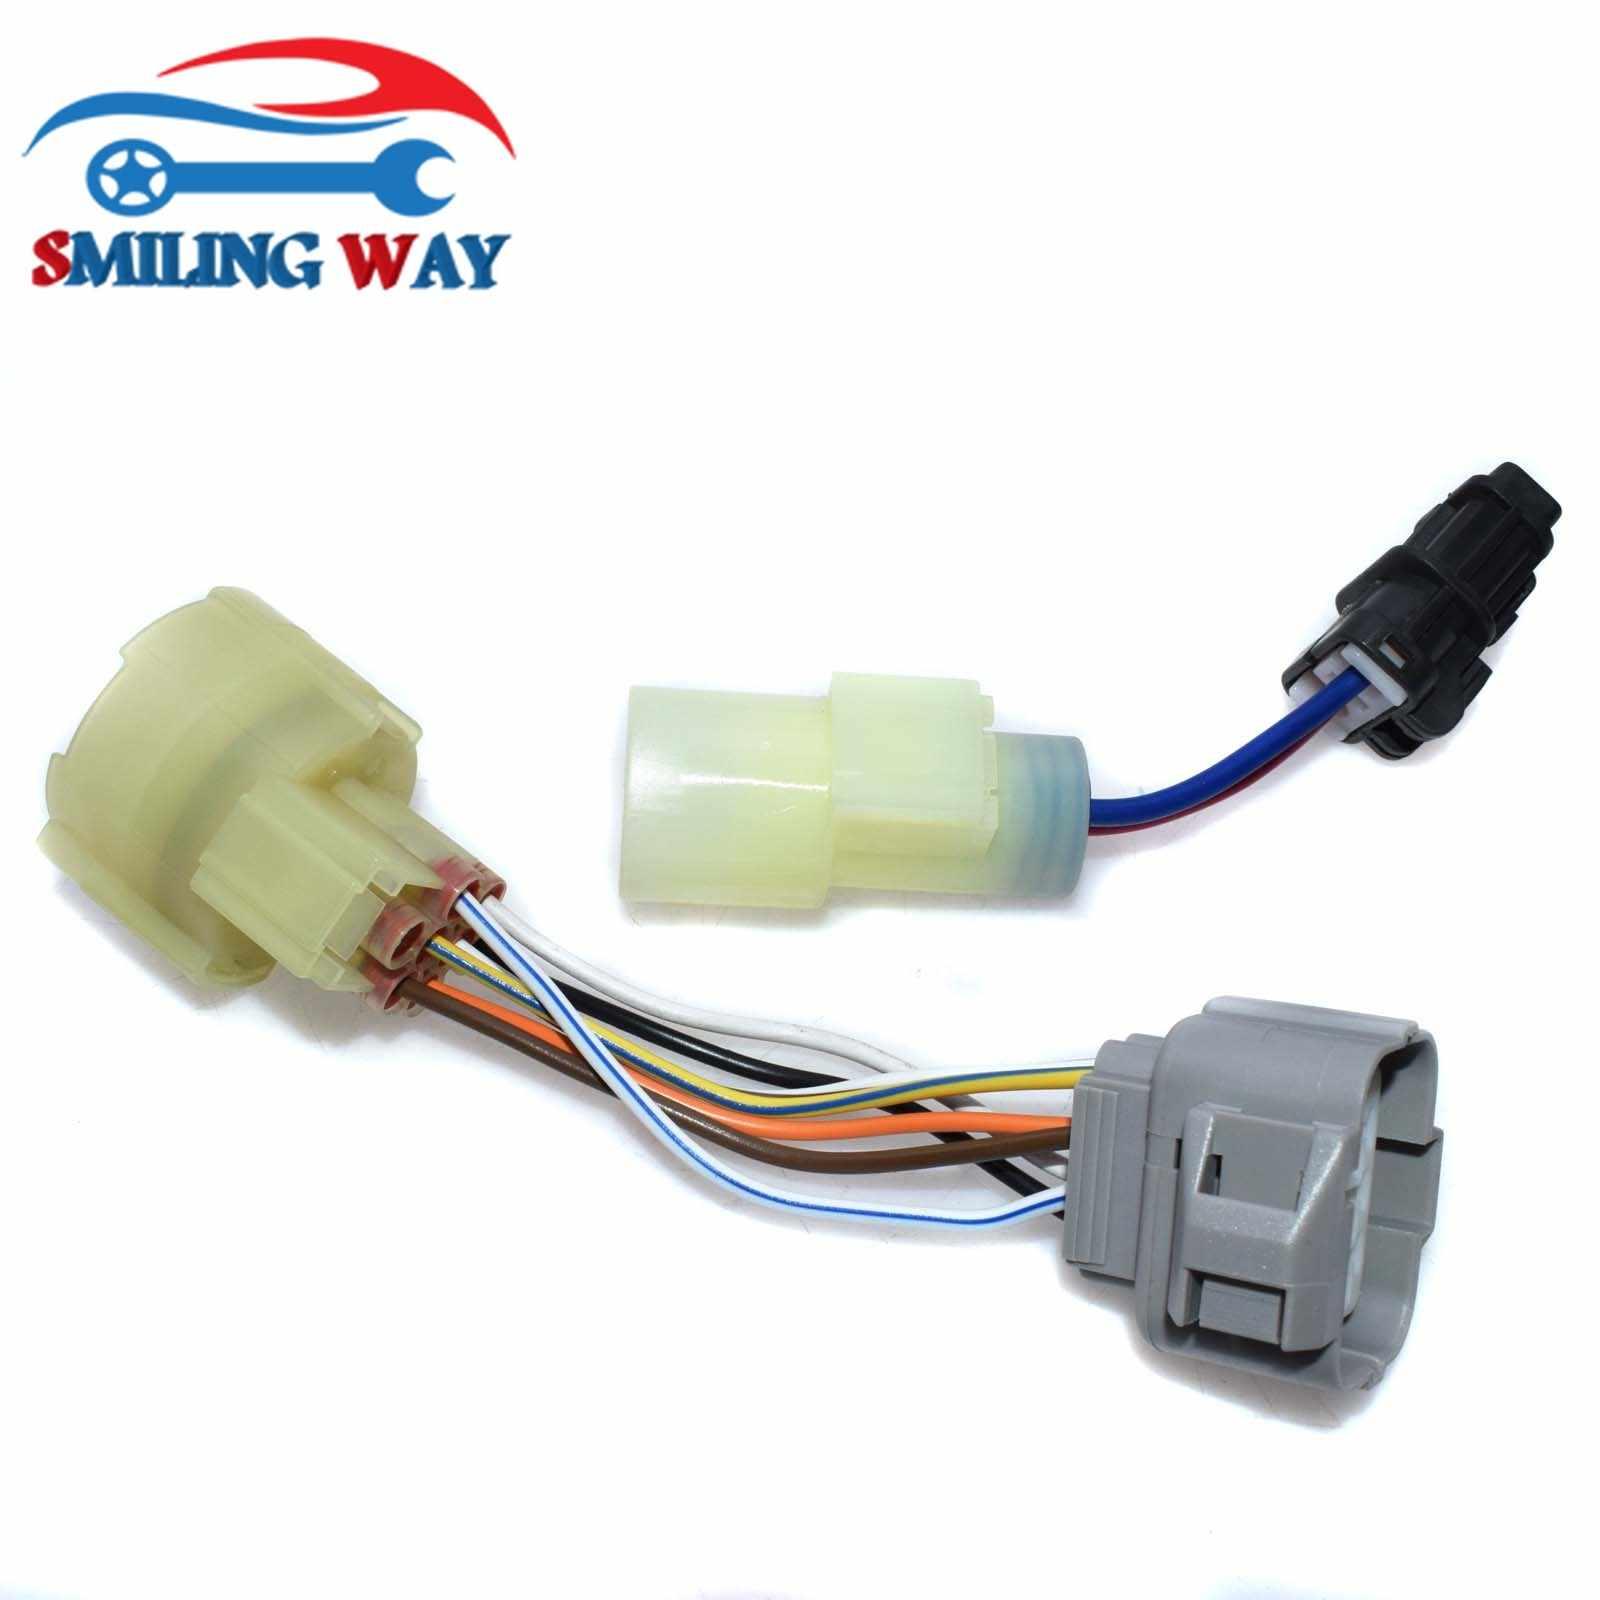 medium resolution of  obd0 to obd1 ecu distributor adaptor connector wire harness cable for honda crx civic prelude acura